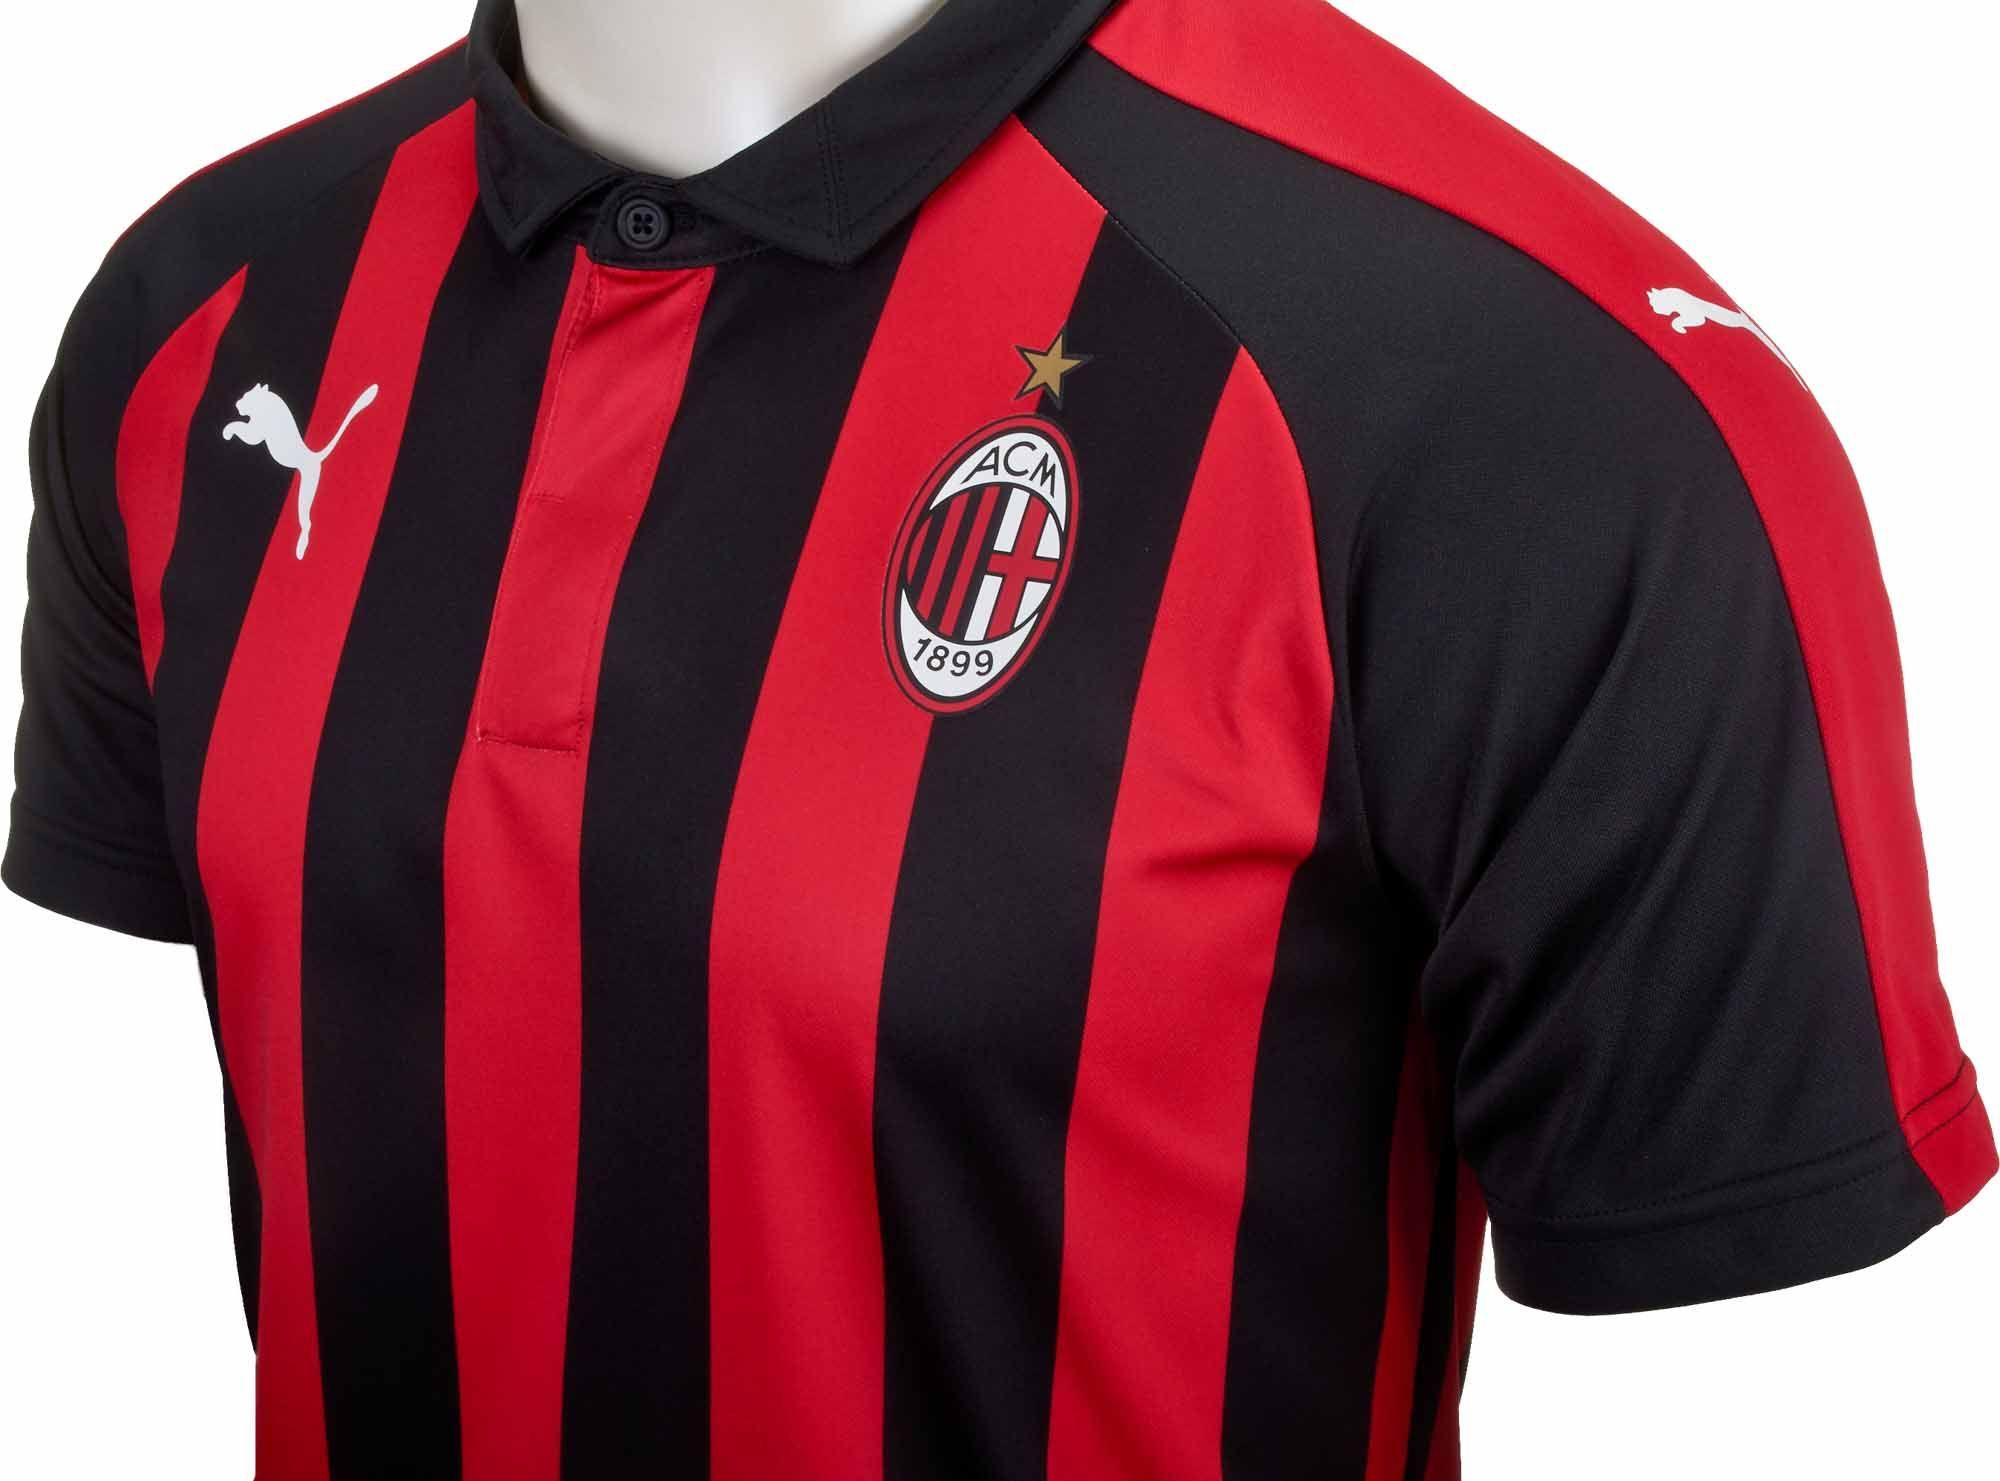 info for 1d27e eb820 PUMA AC Milan Home Jersey – Special Edition 2018-19 | Fútbol ...